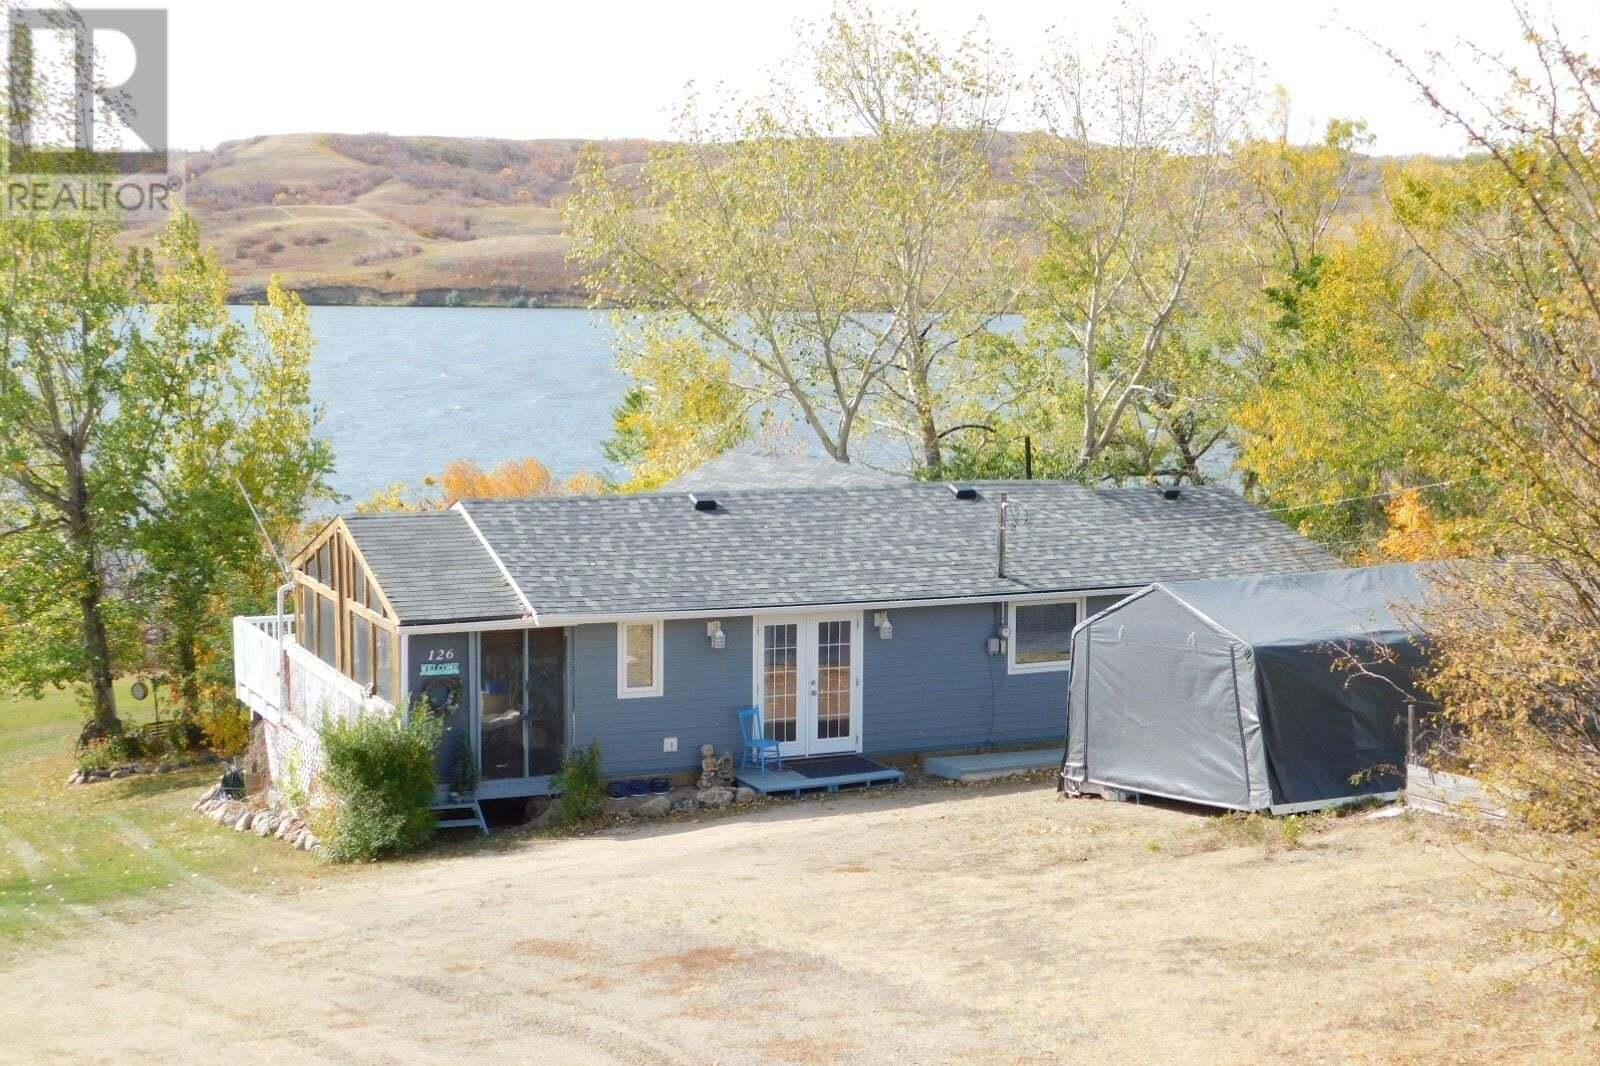 House for sale at 126 Garwell Dr Buffalo Pound Lake Saskatchewan - MLS: SK828099